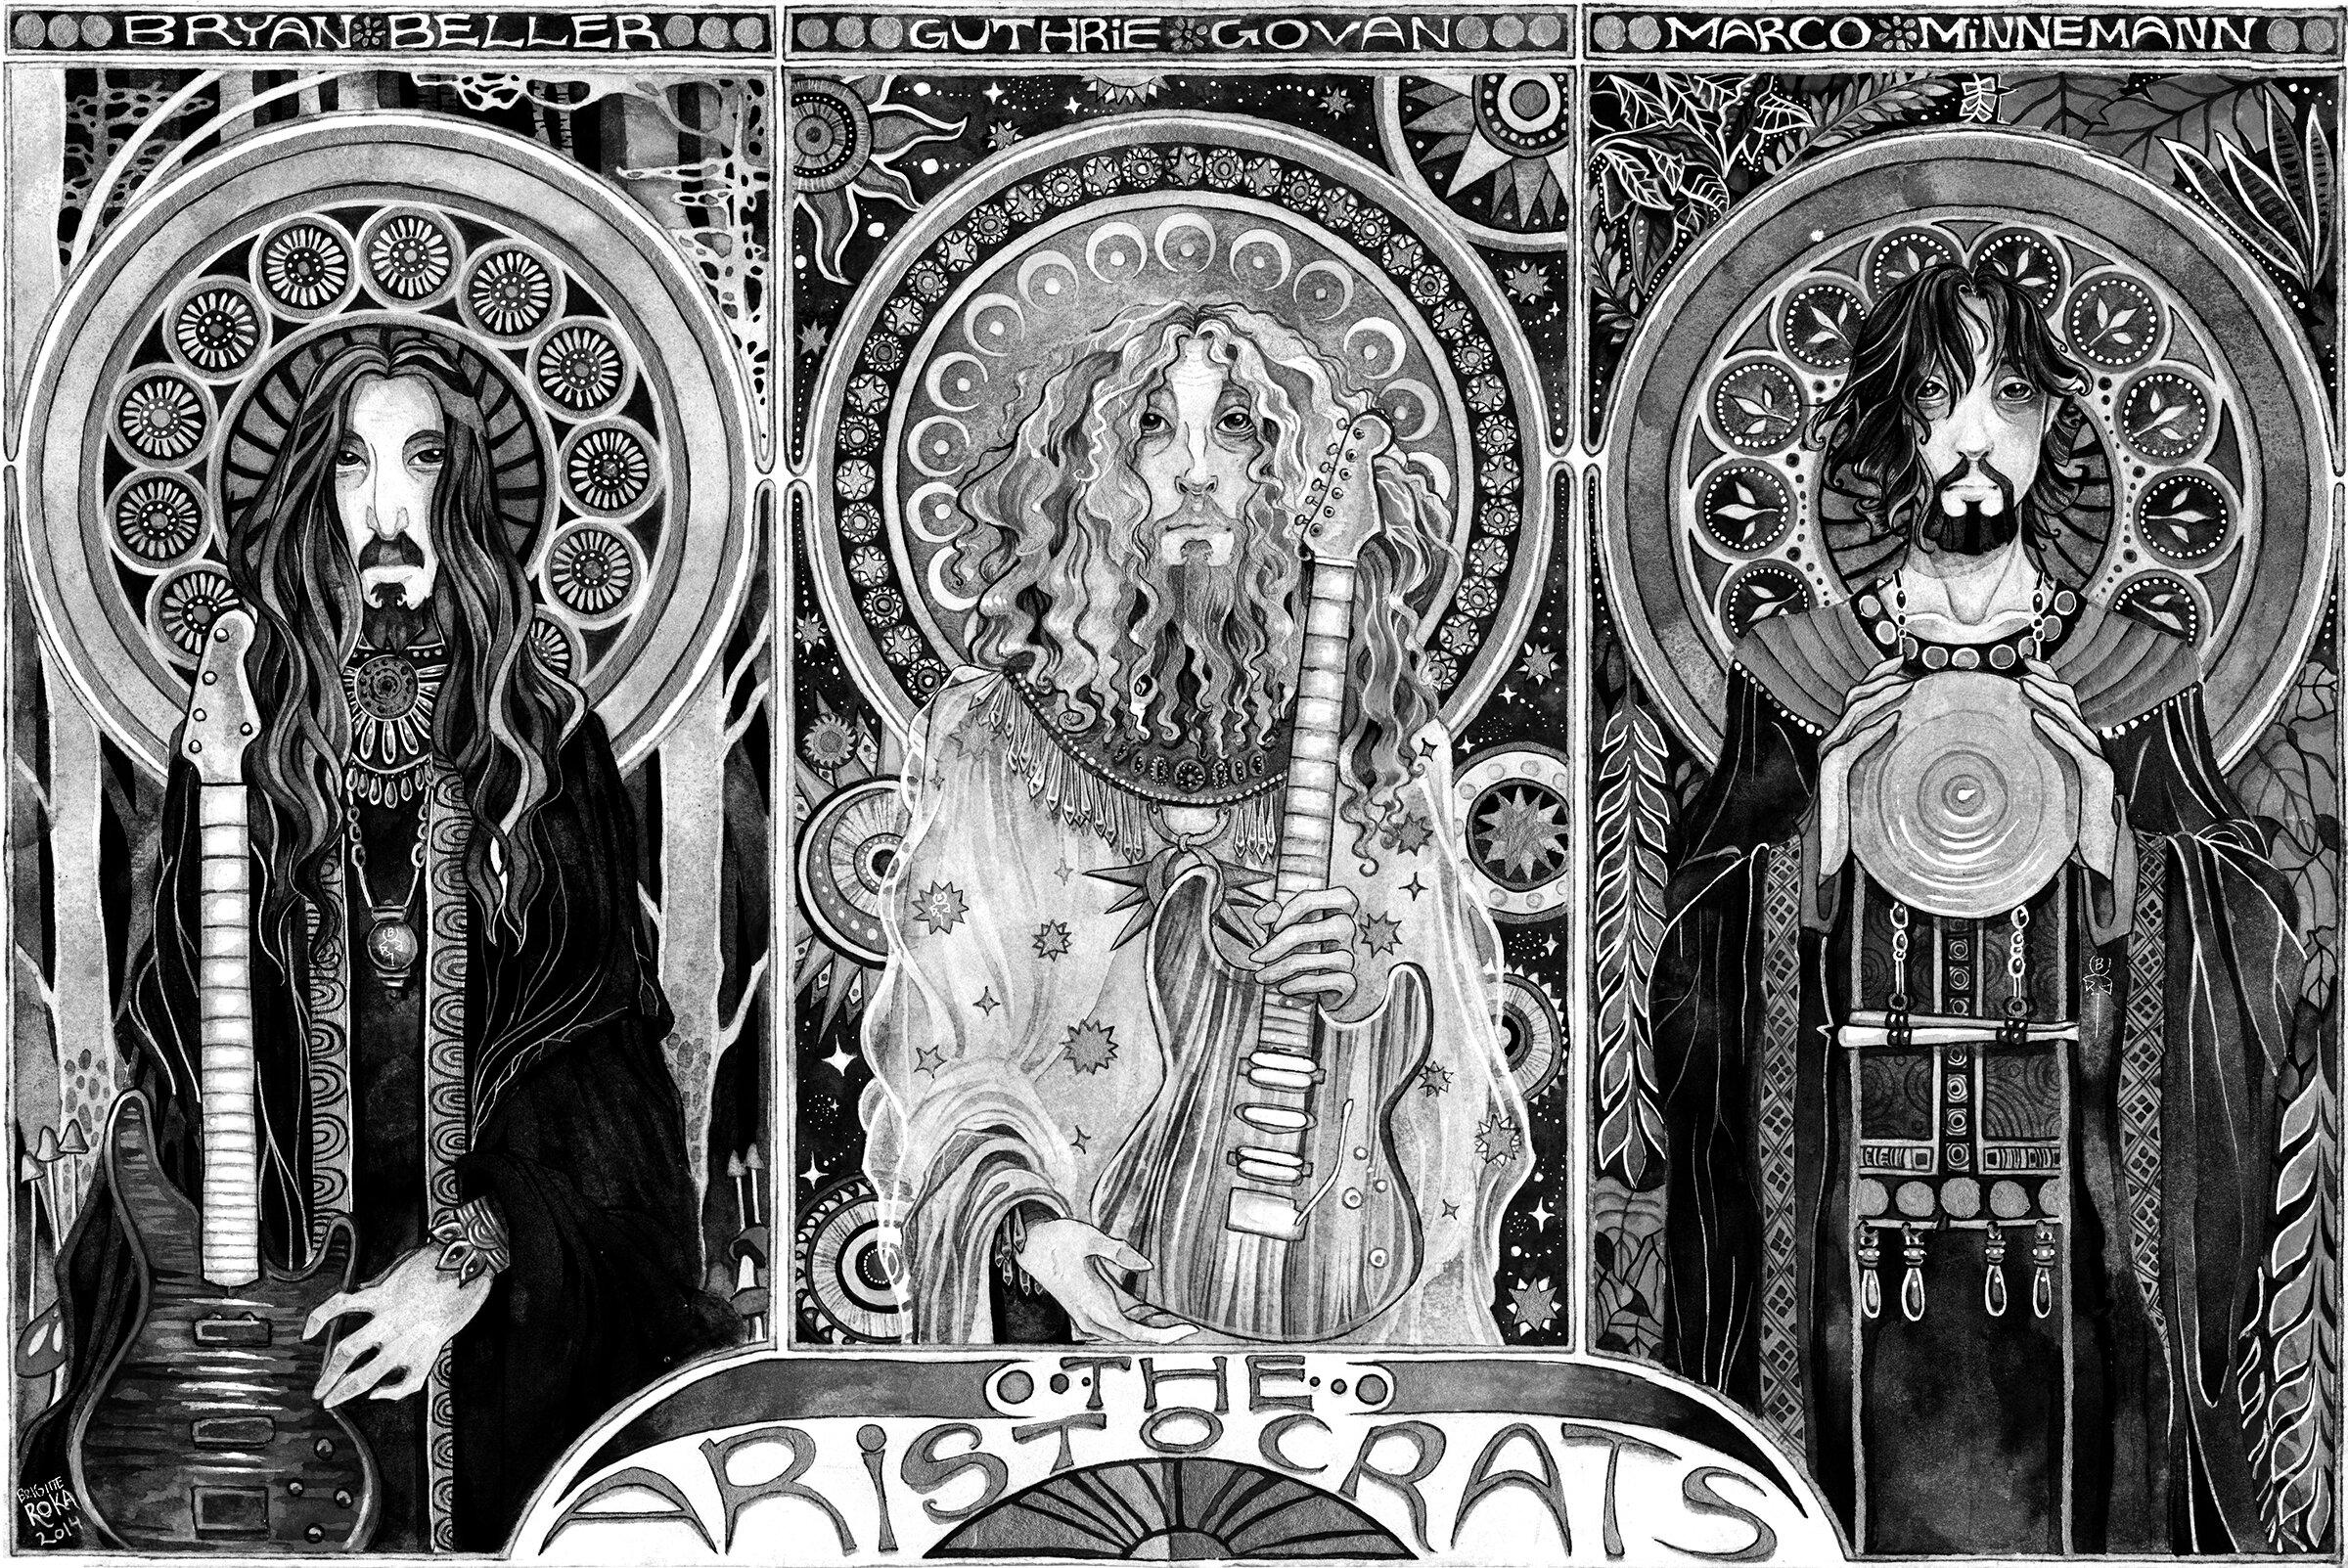 Brigitte Roka_Aristocrats scan black and white small.jpg